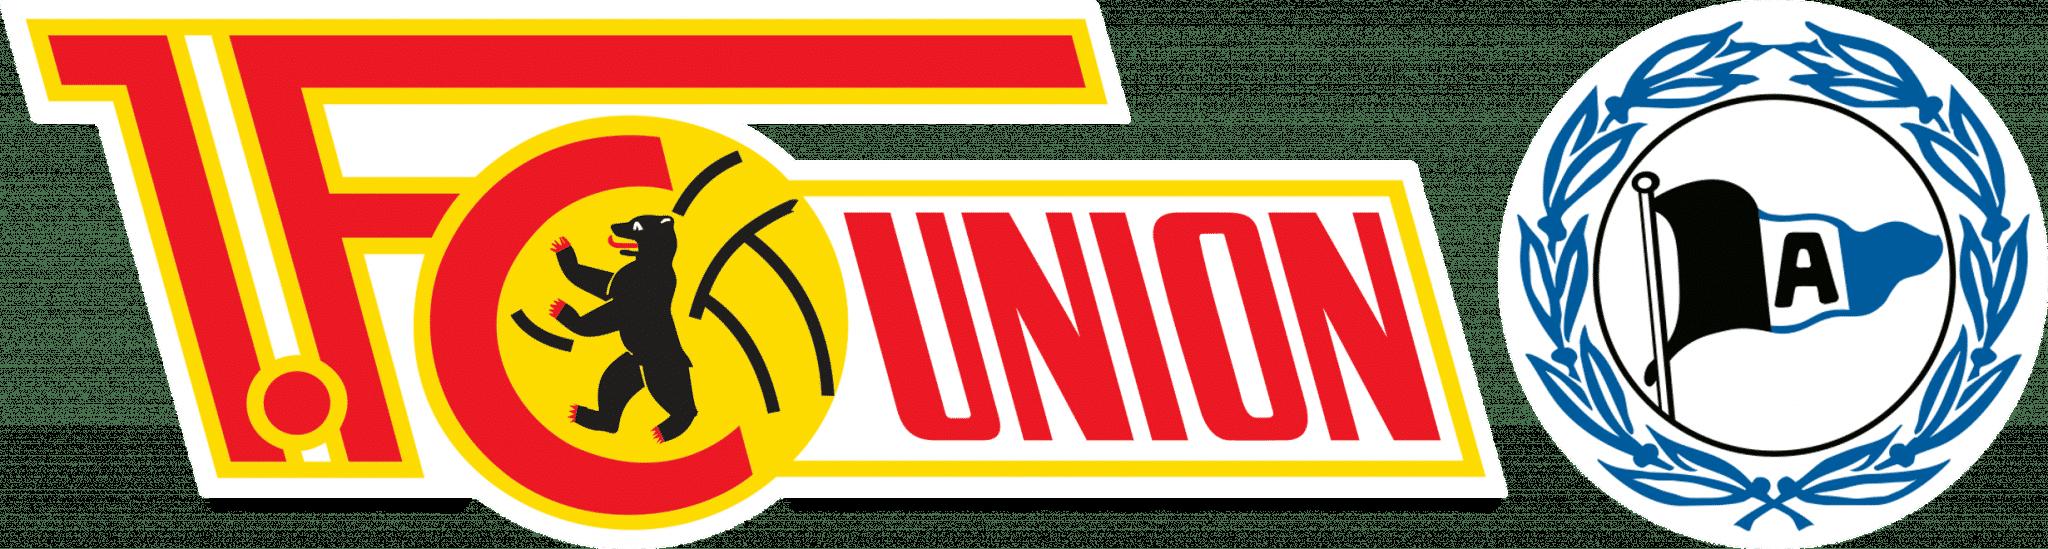 Union Berlin - Bielefeld Tipp und Prognose (25/09/2021)